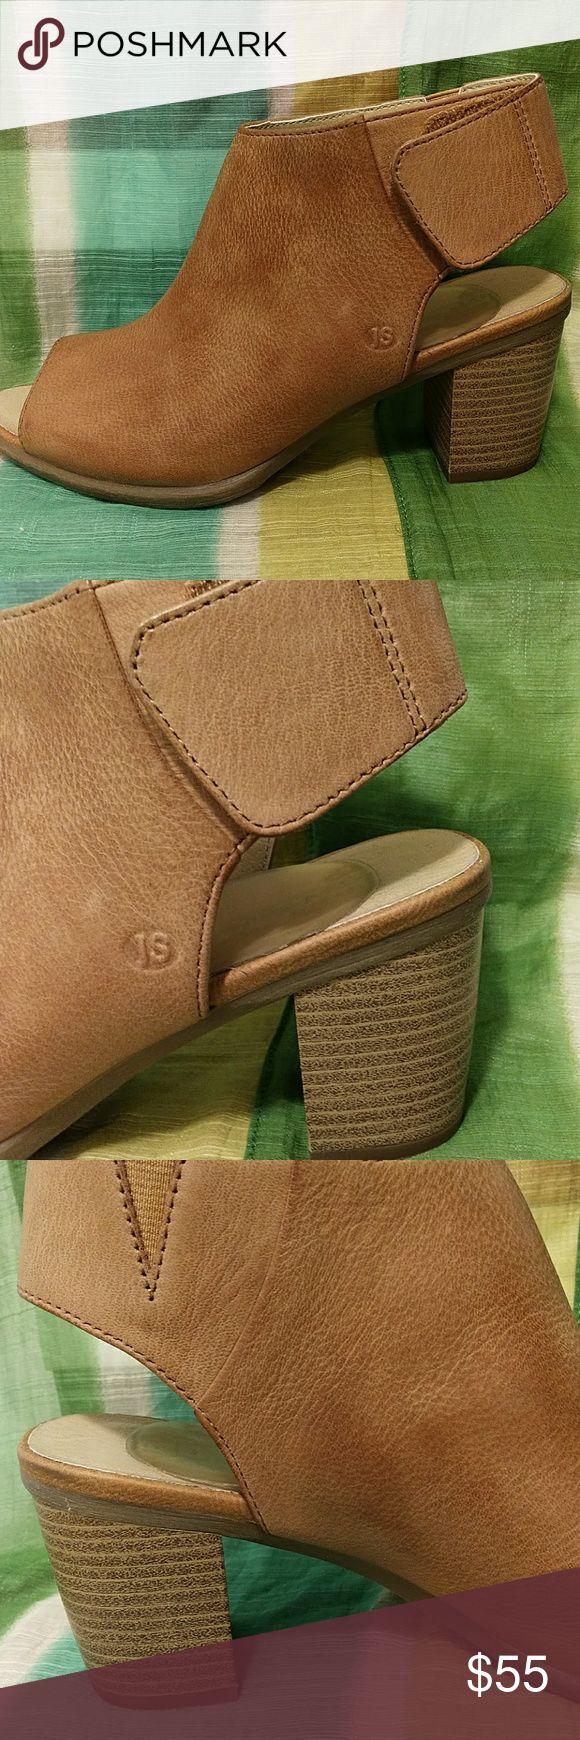 "Josef Seibel NWOT,open toe leather bootie Never worn,very soft leather , light brown color heel 3"" Josef Seibel Shoes Heeled Boots"